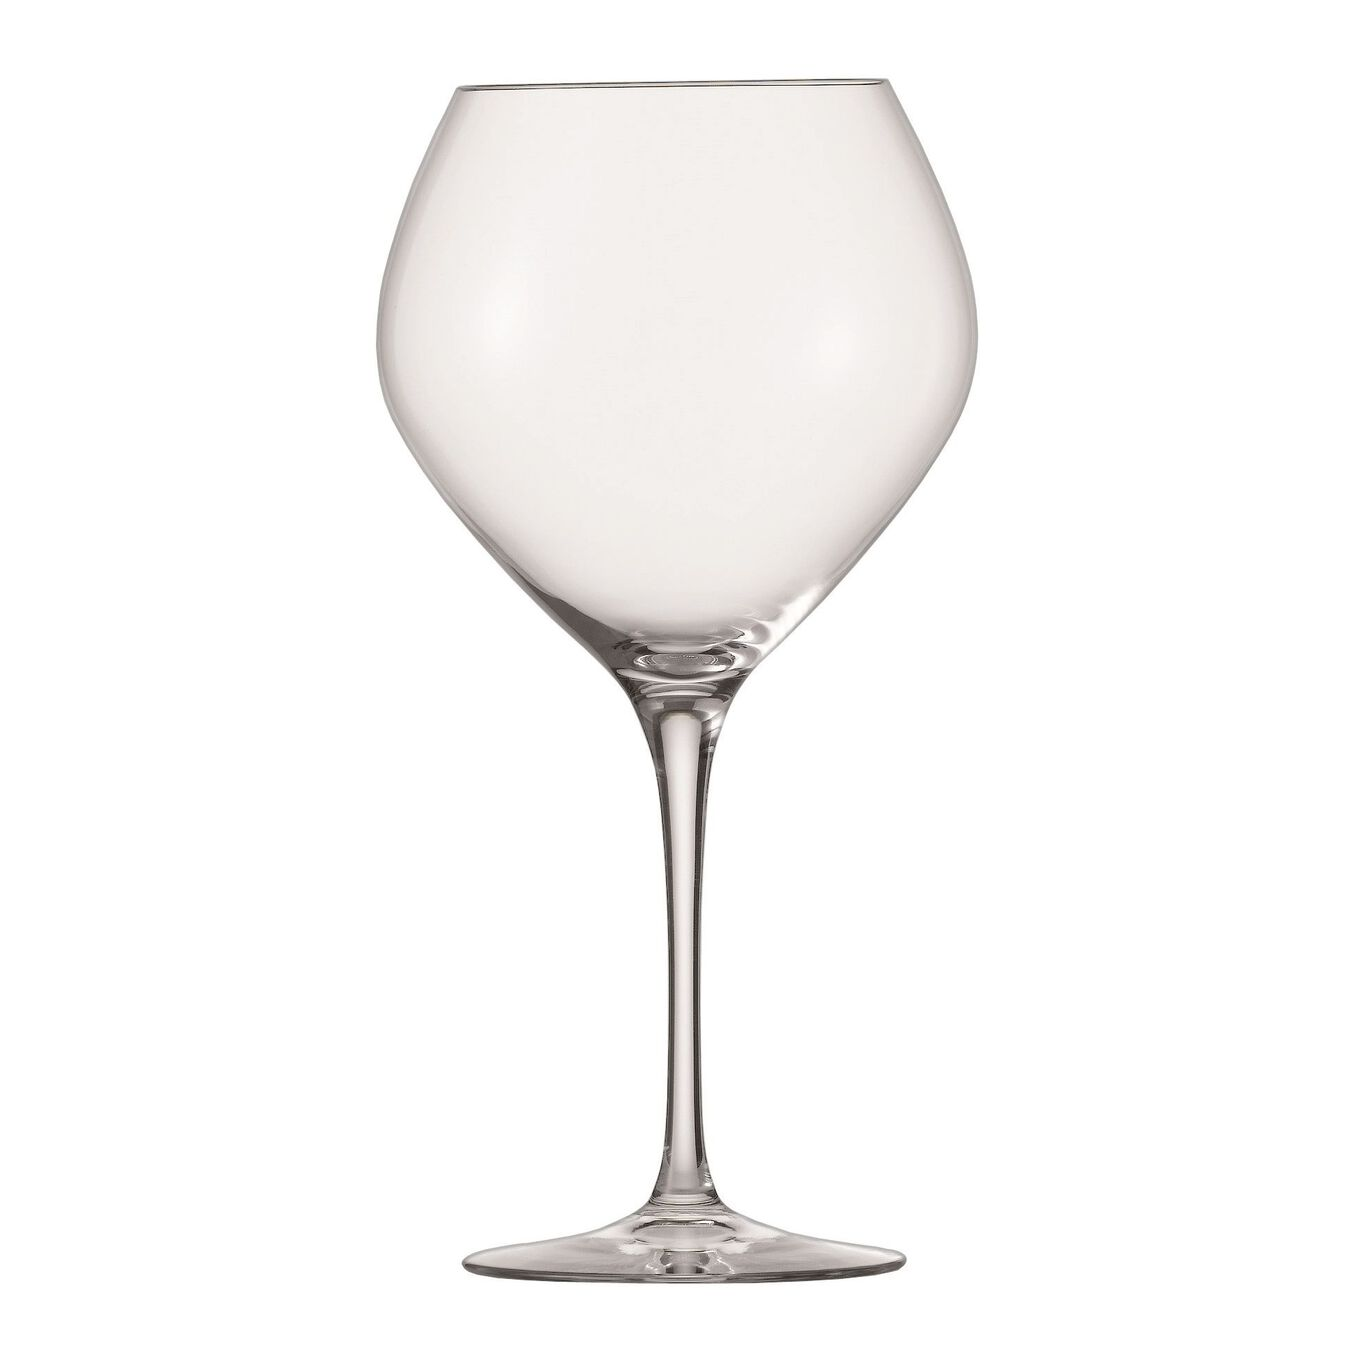 Taça para vinho tinto 675 ml,,large 1